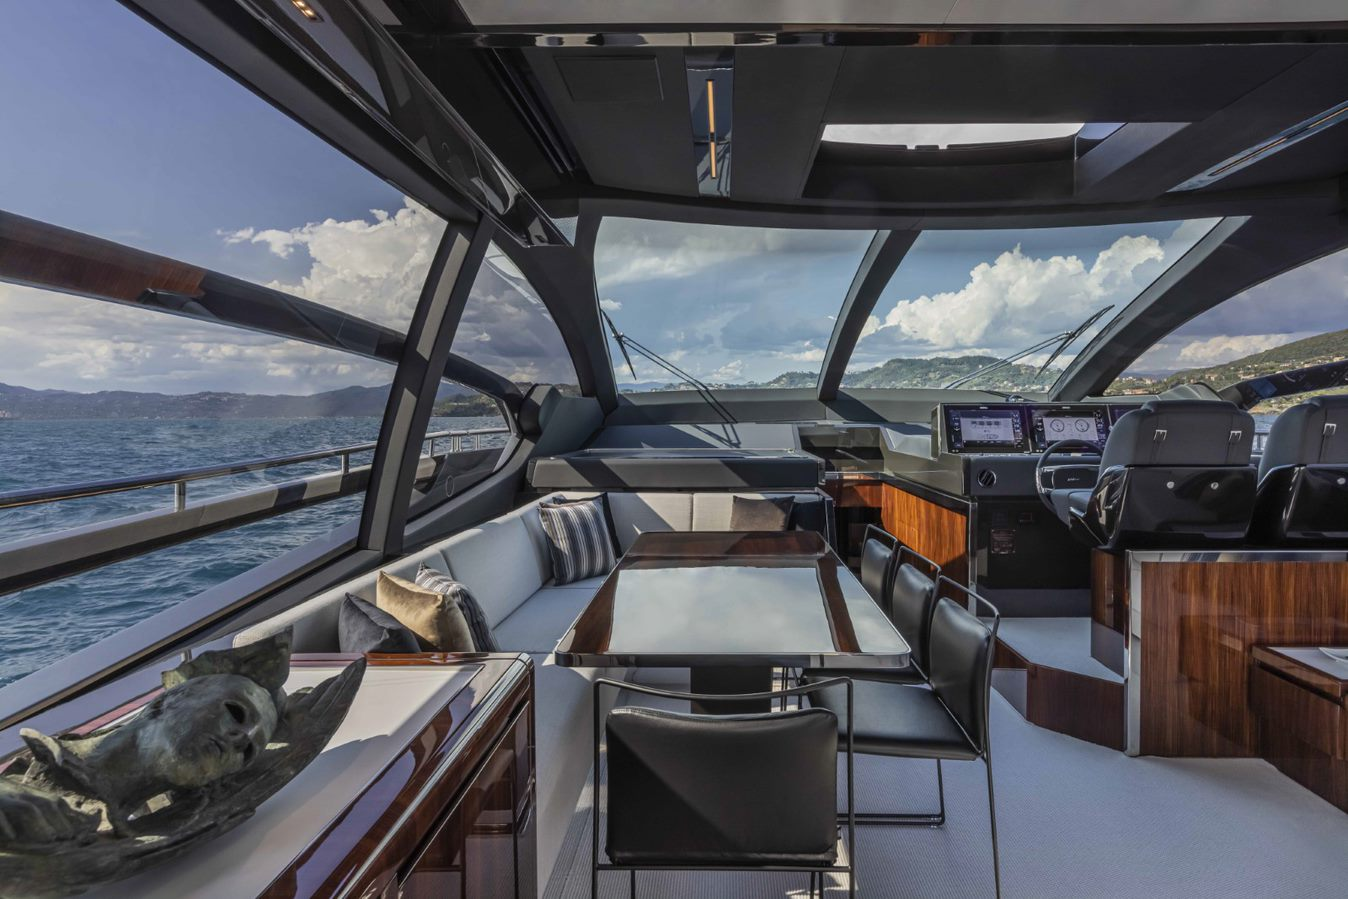 Riva 76 Perseo Super boat shopping 10